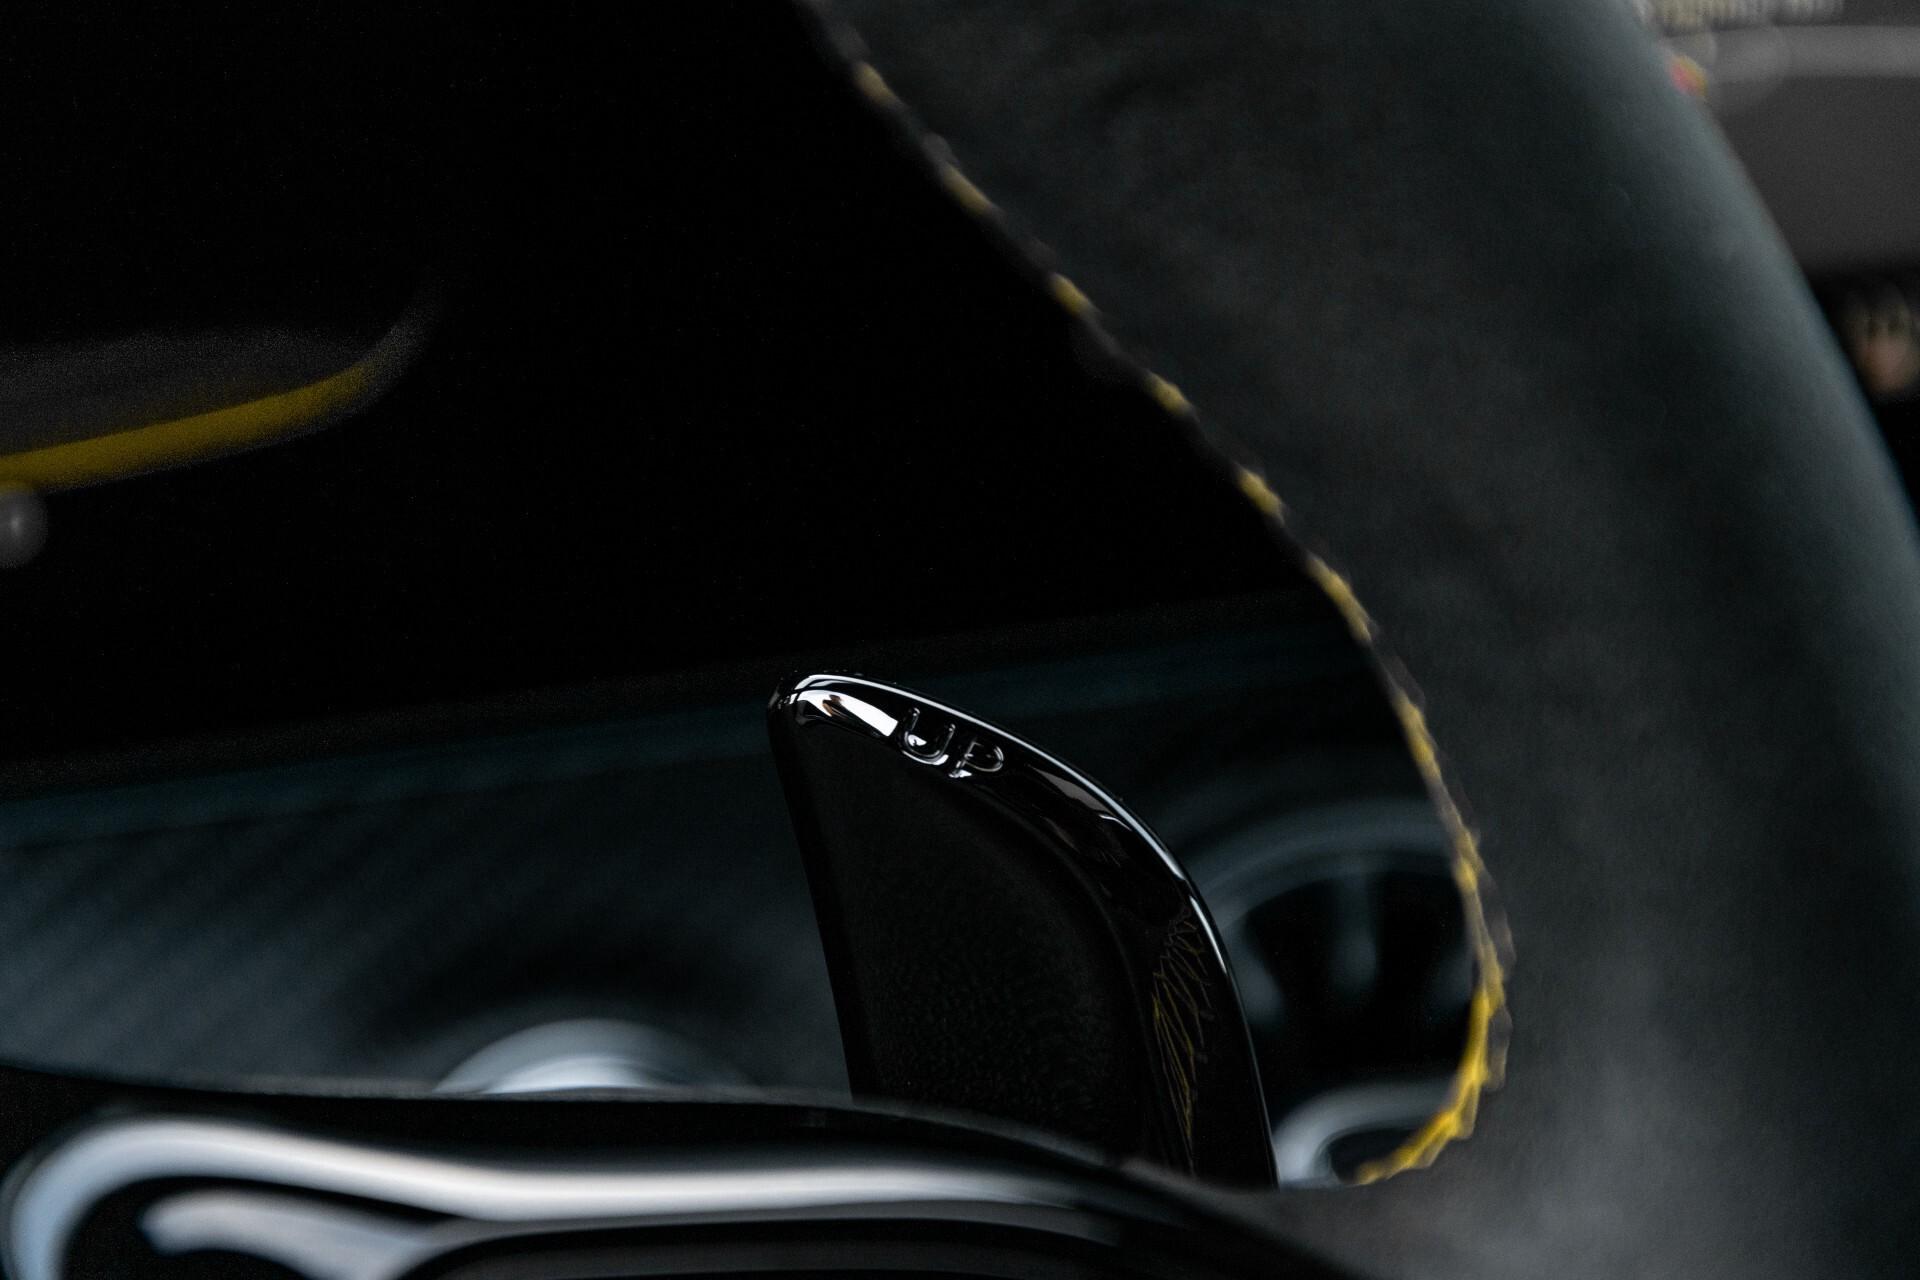 Mercedes-Benz AMG GT 4-Door Coupe 63 S 4MATIC+ Edition 1 Keramisch/Carbon/First Class/Dynamic Plus/Burmester High End 3D Aut9 Foto 15